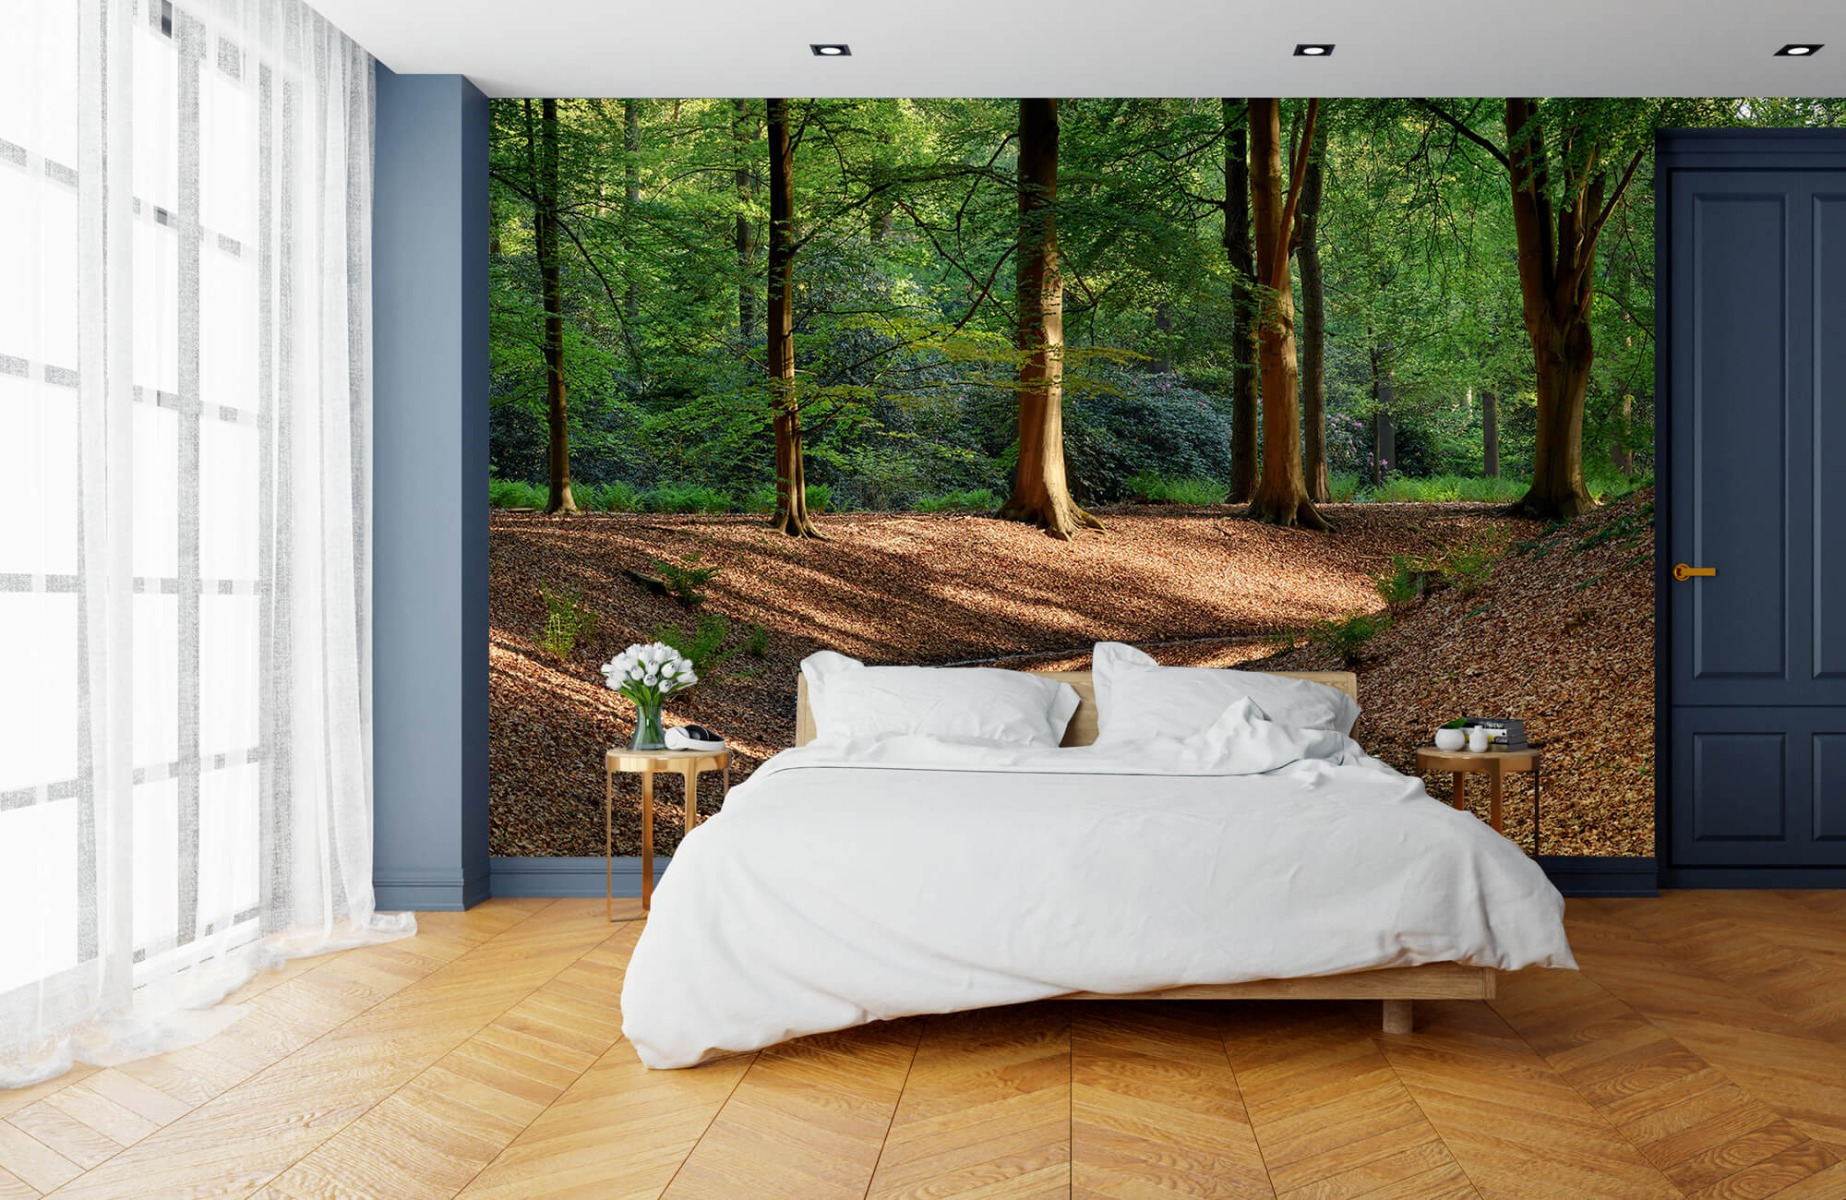 Bos behang - Beekje in bos - Wallexclusive - Slaapkamer 16